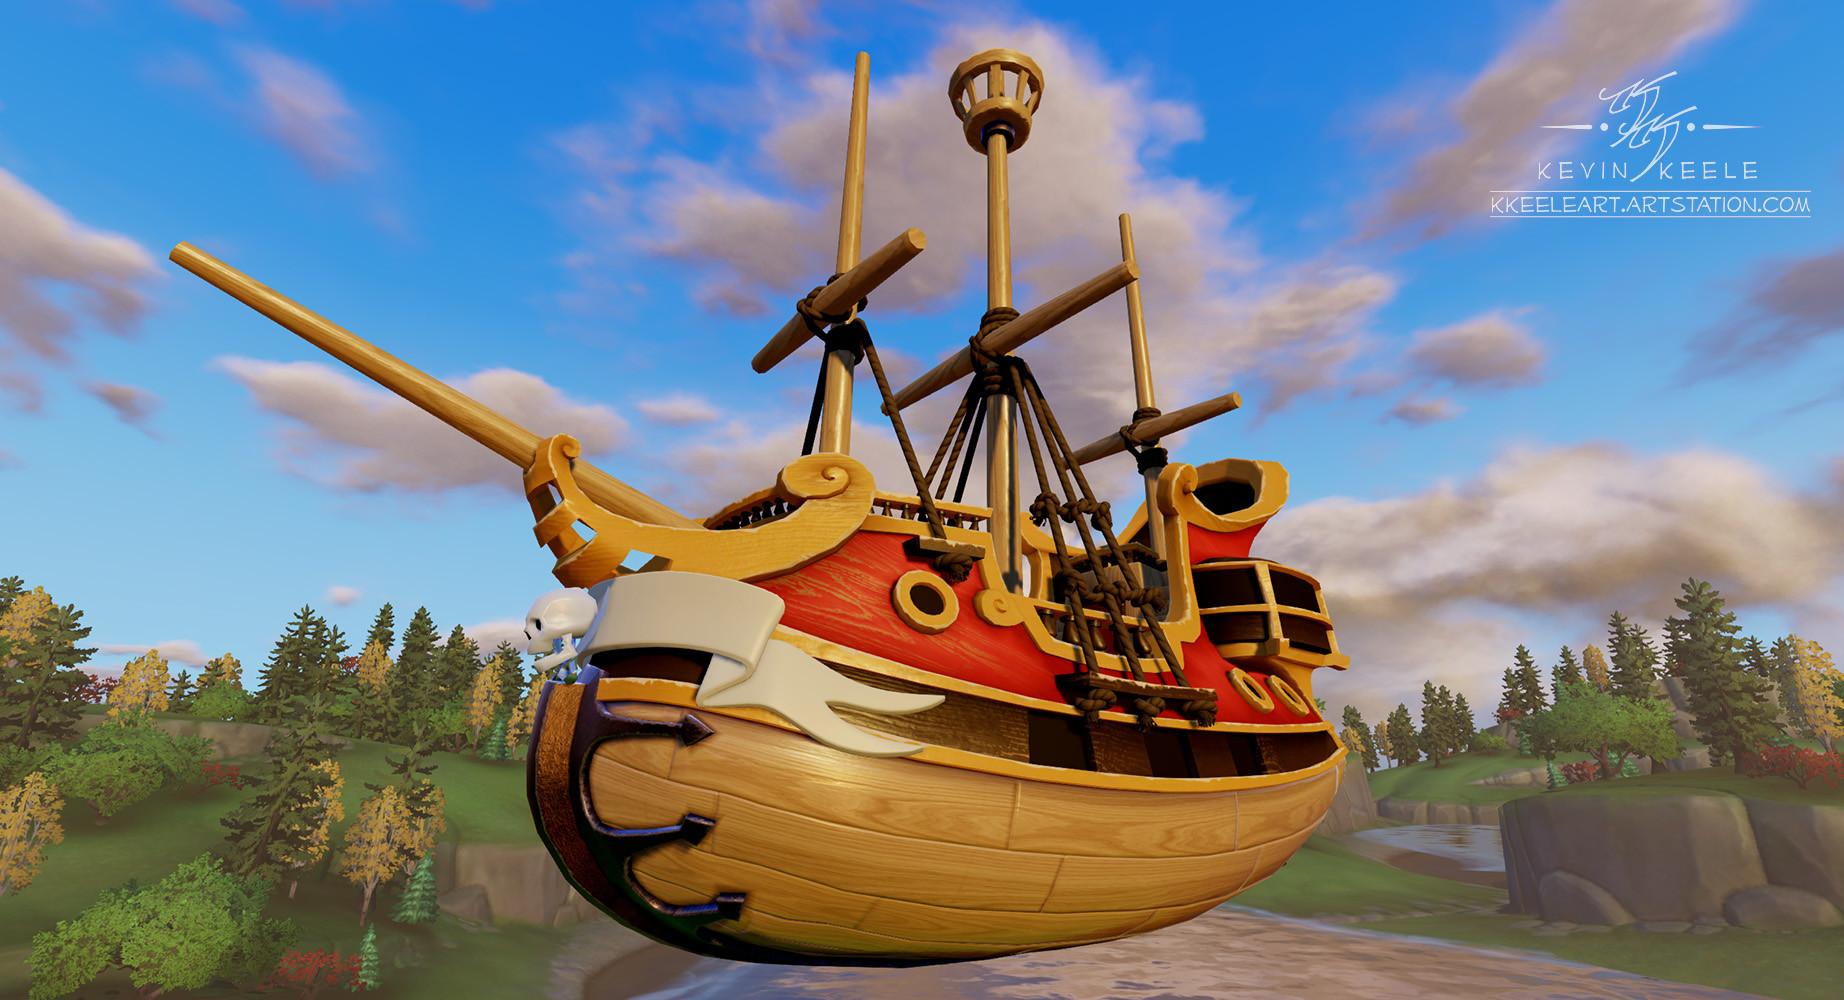 Kevin keele pirateship 1